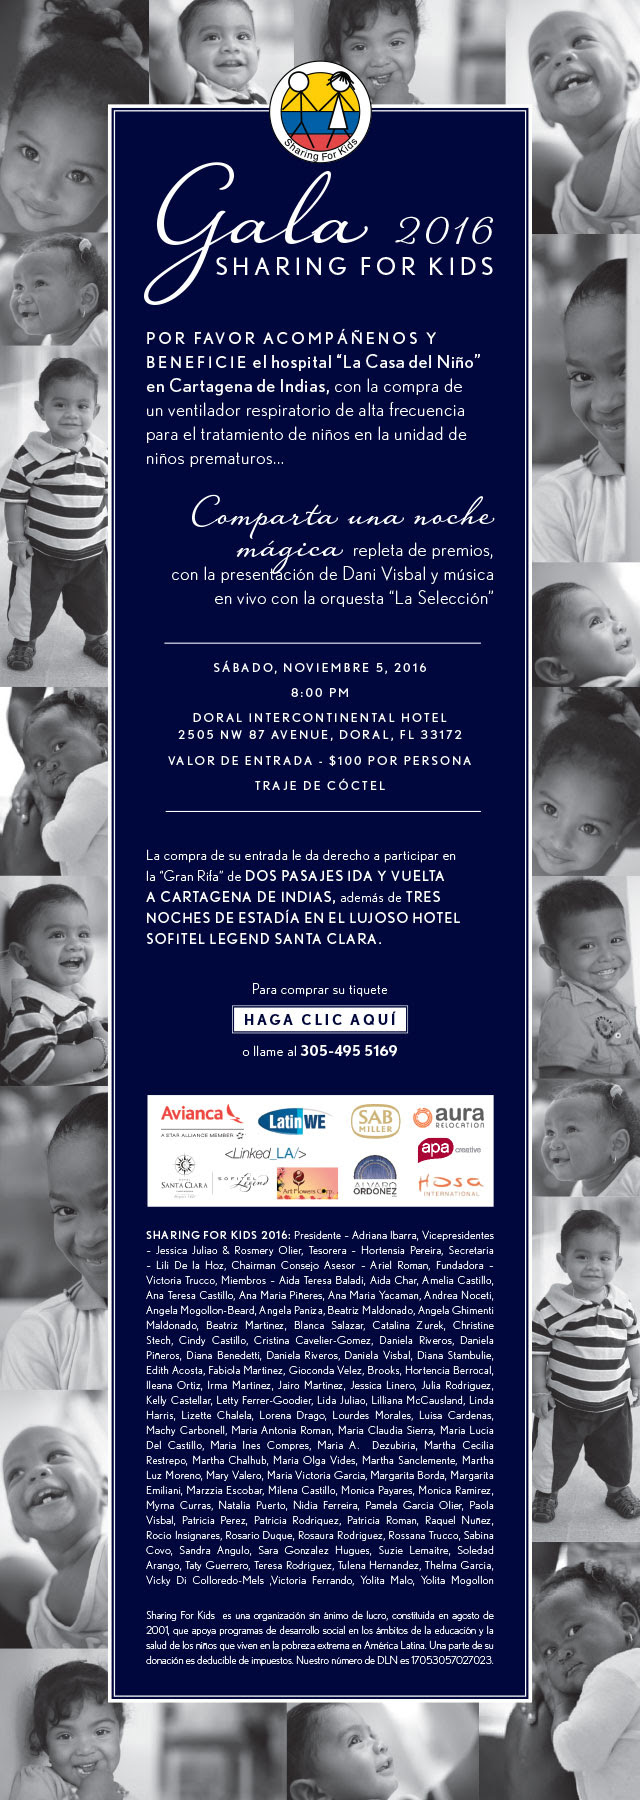 Gala 2016 Sharing for Kids